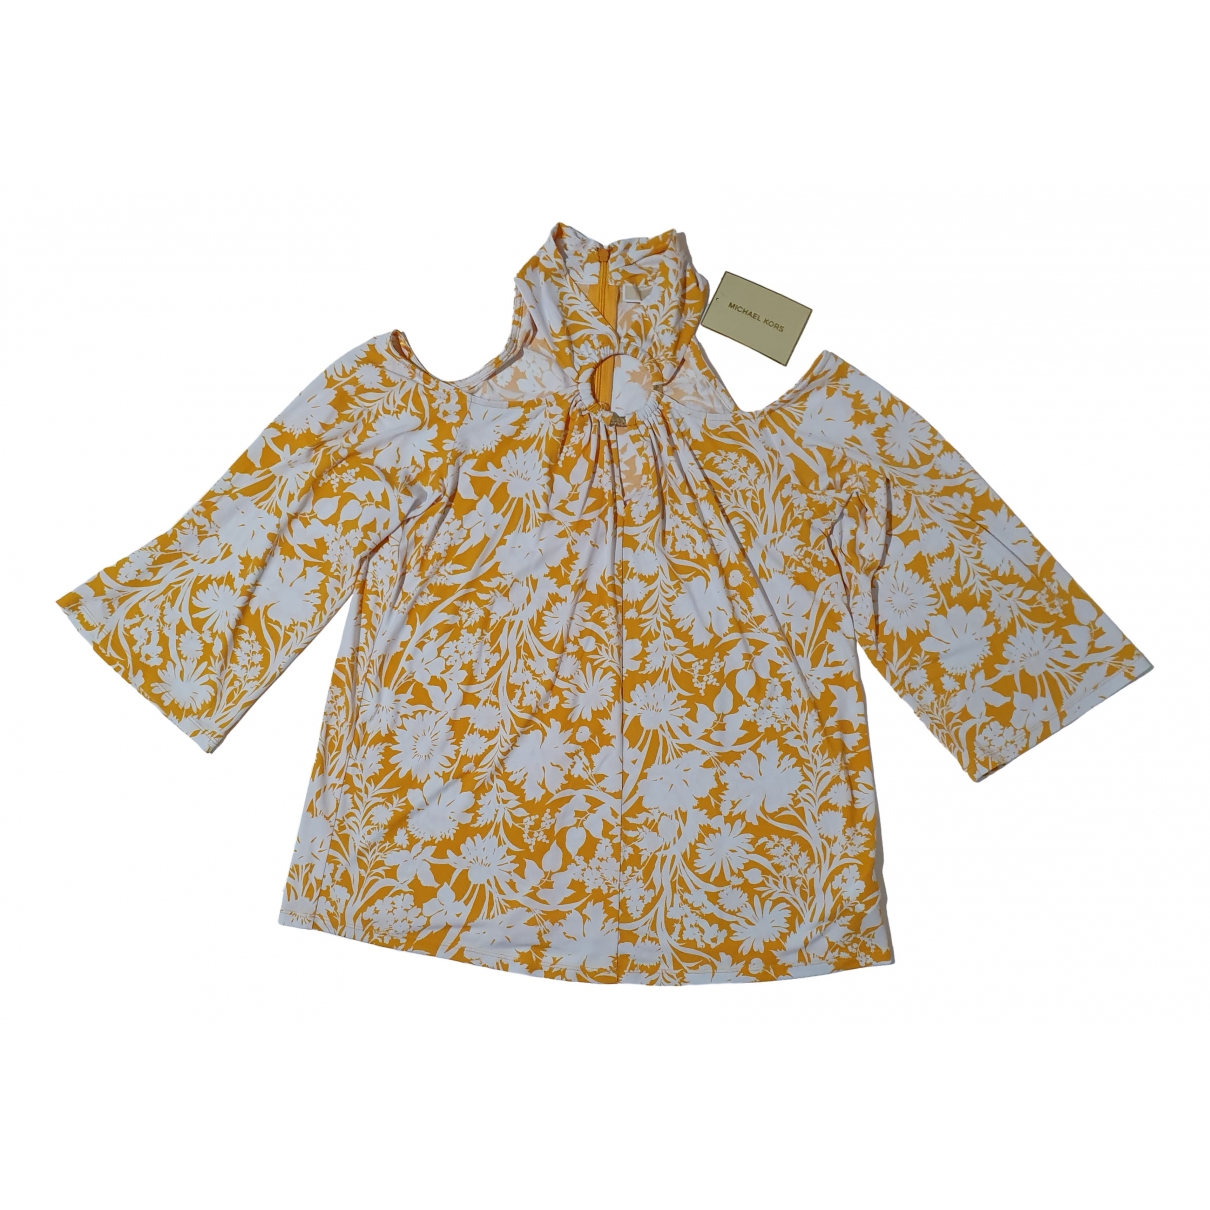 Michael Kors \N Yellow  top for Women L International